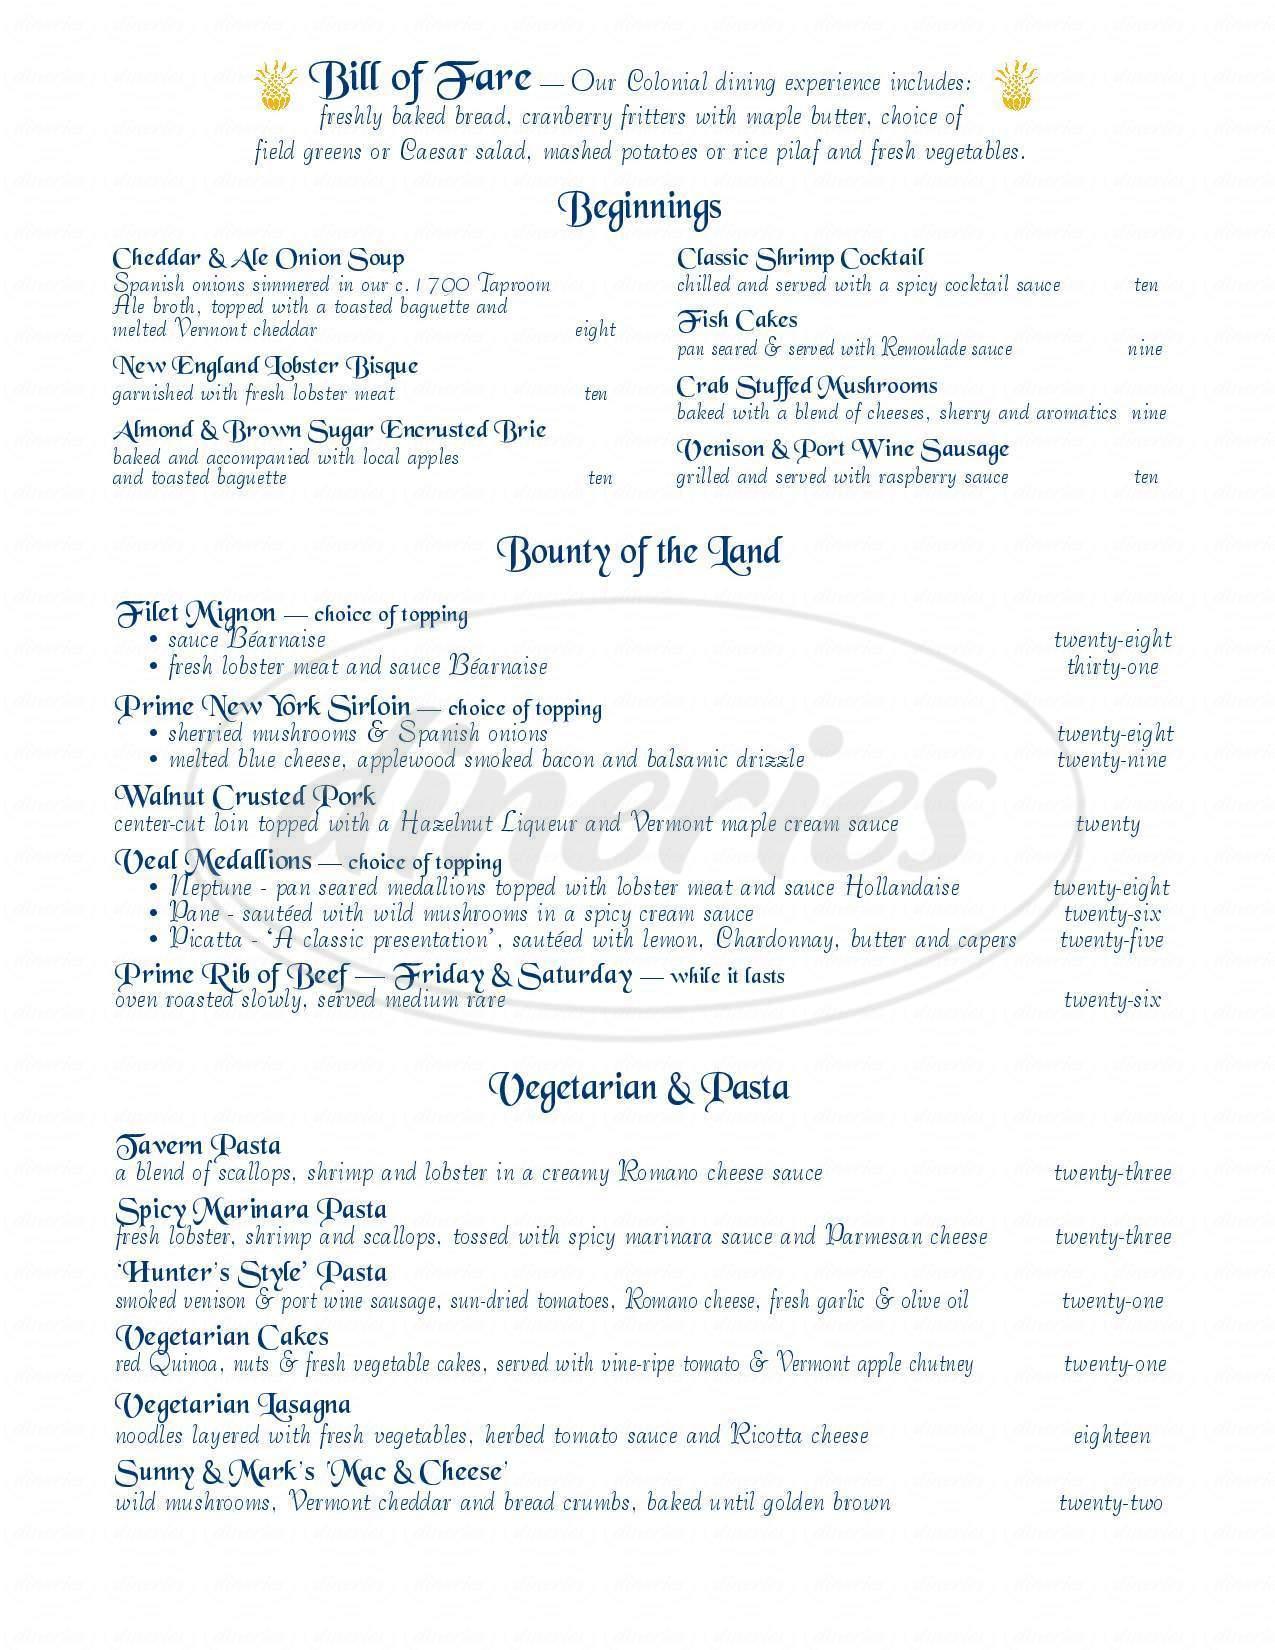 menu for Ye Olde Tavern